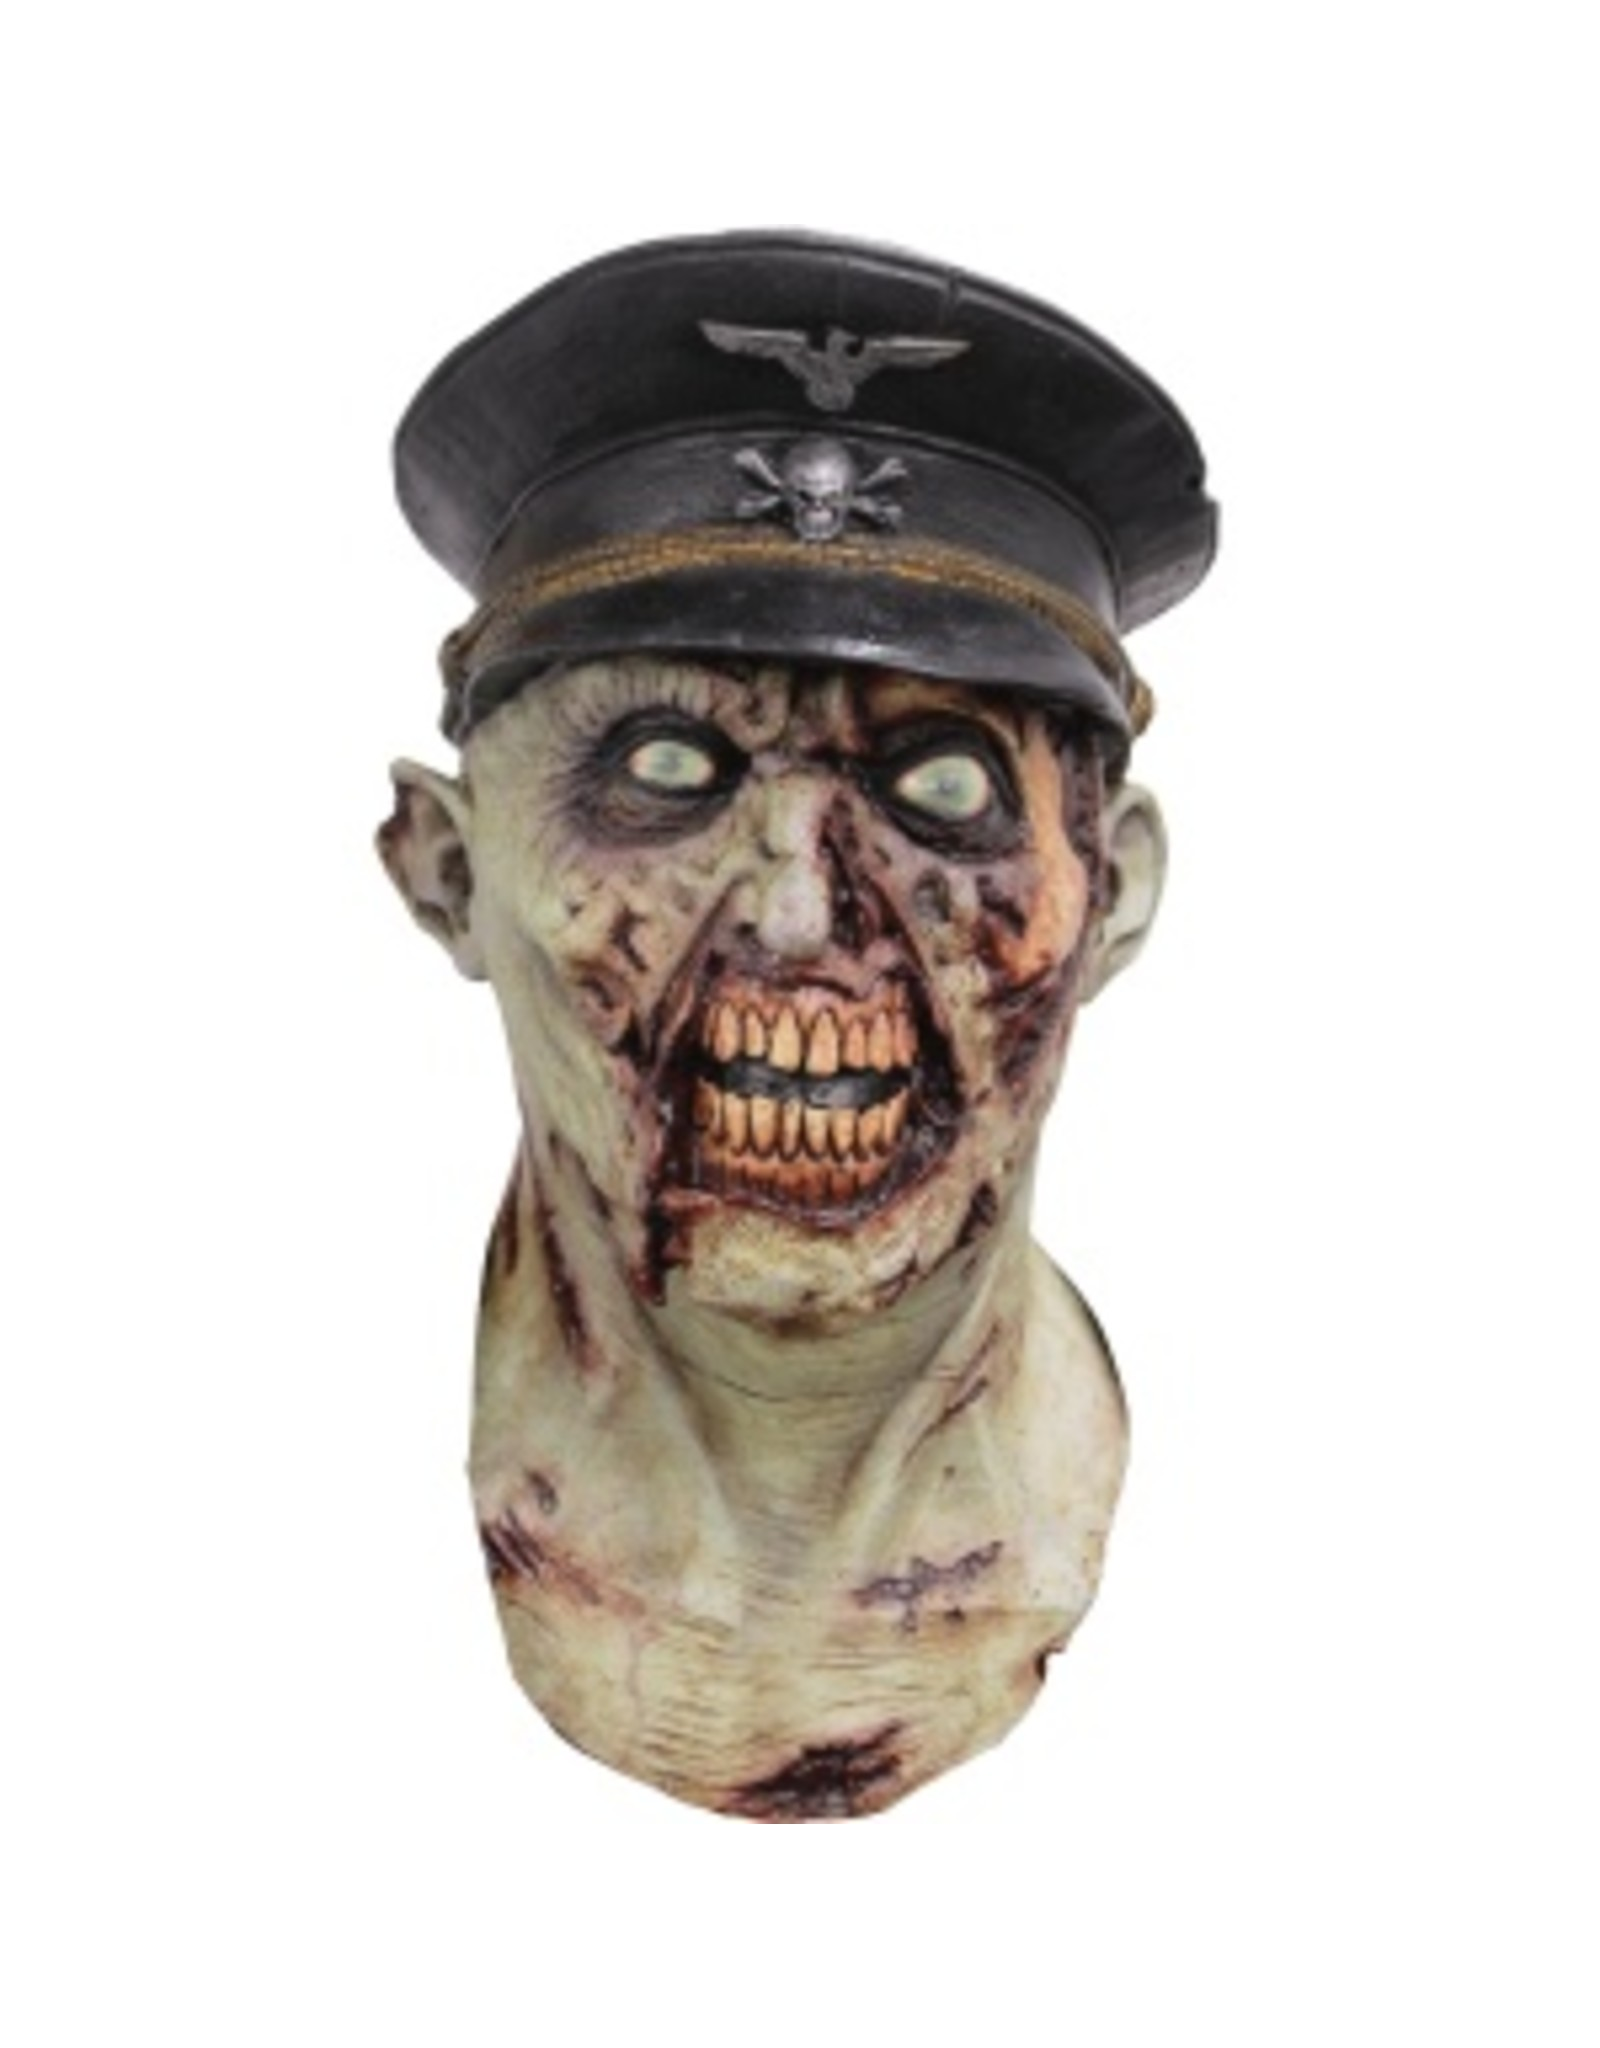 Ghoulish Heer Zombie Mask